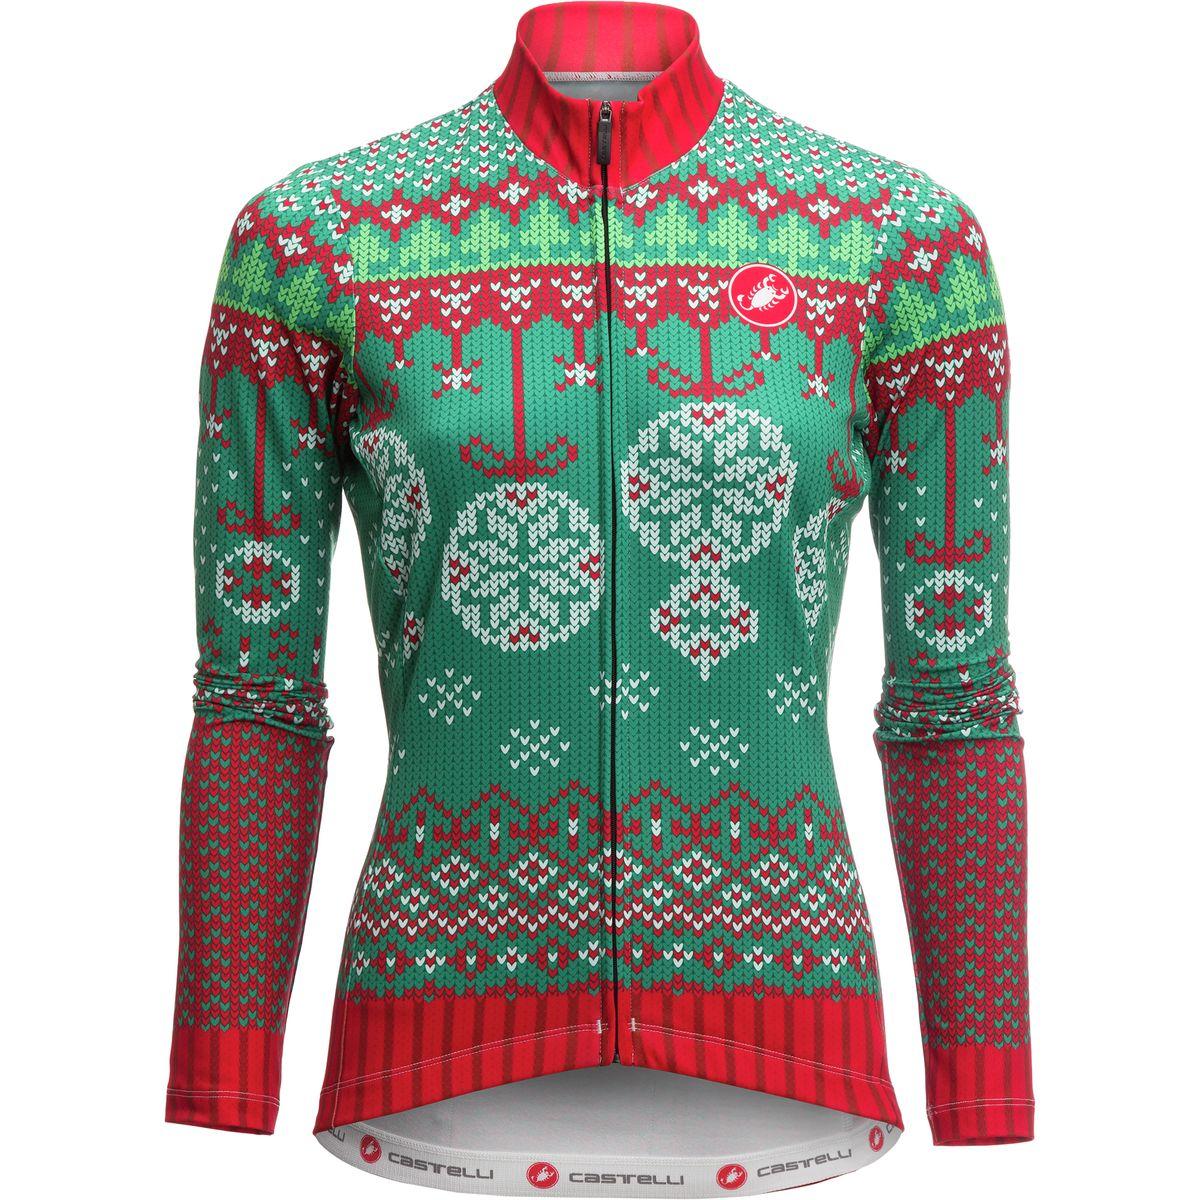 Christmas Lights Jersey: Castelli Holiday 2016 Sweater Jersey